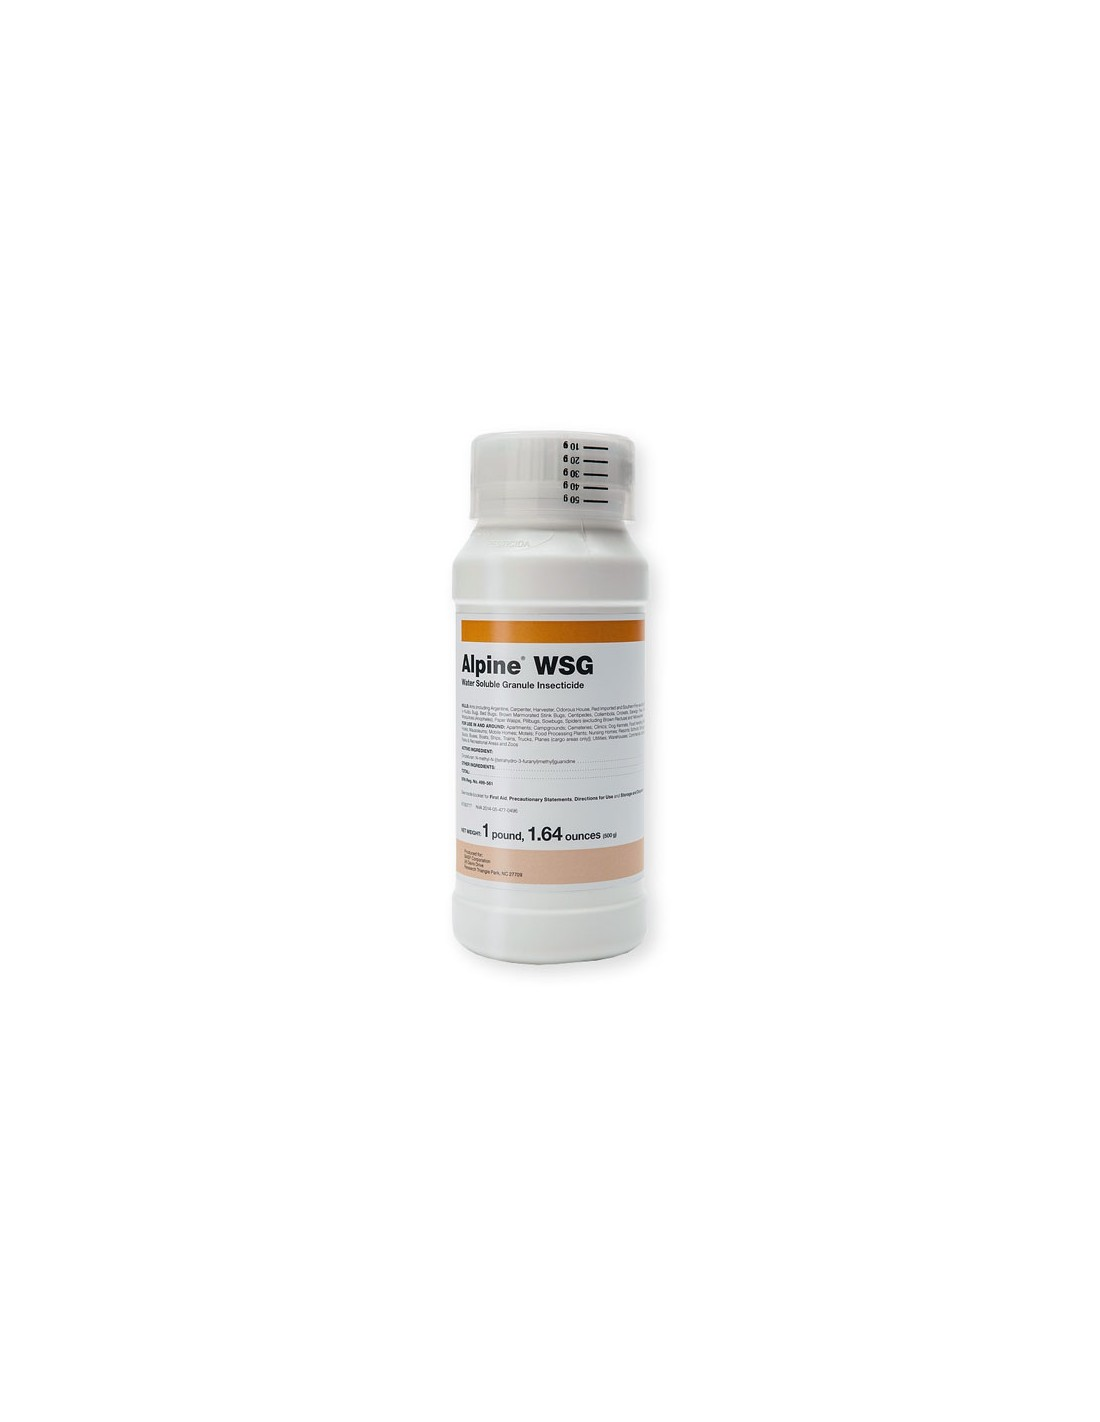 Alpine WSG Insecticide 500 gram